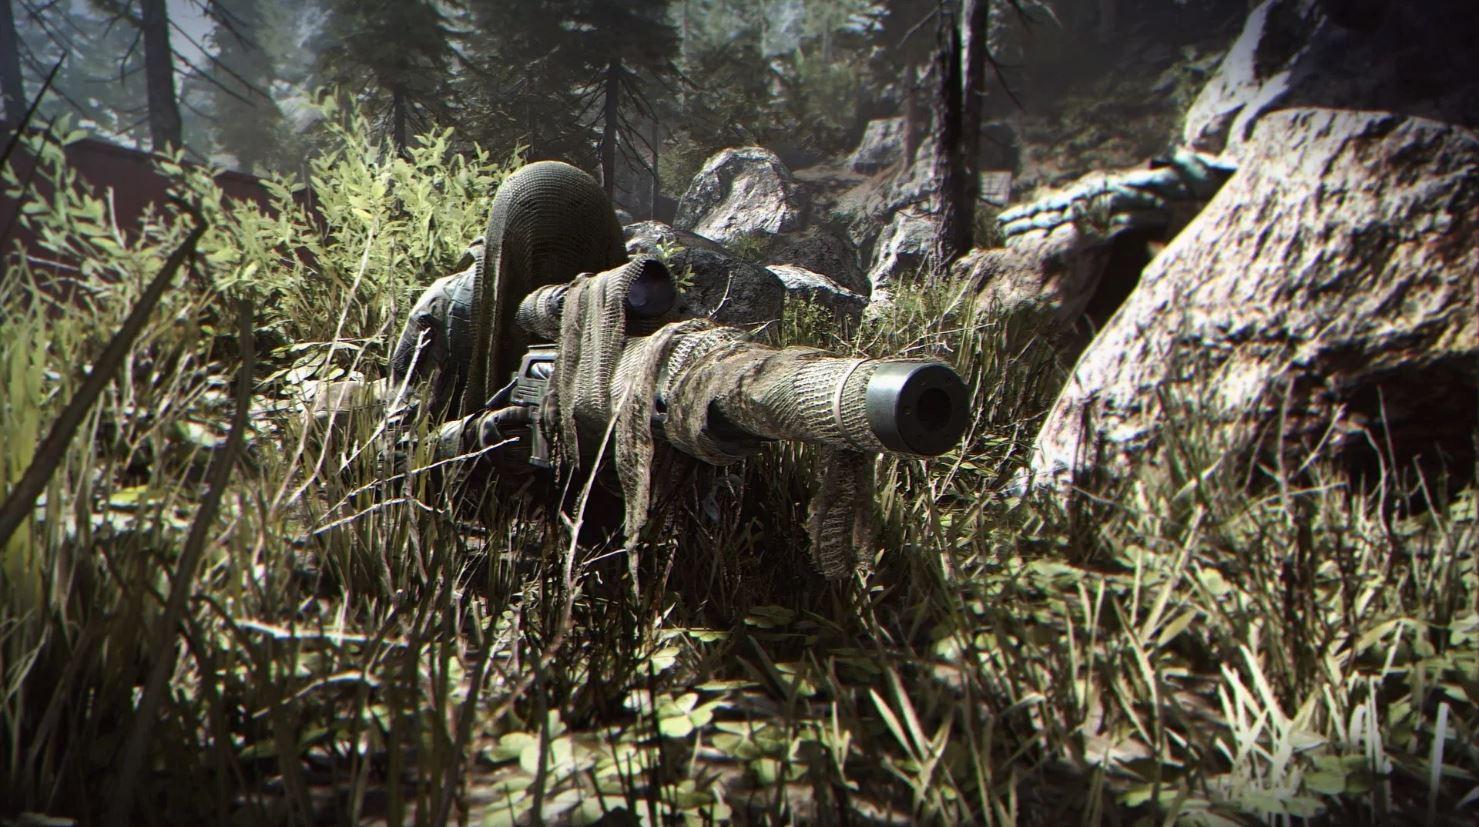 ویدئوی کوتاهی از بخش شخصی سازی سلاح Call of Duty: Modern Warfare منتشر شد